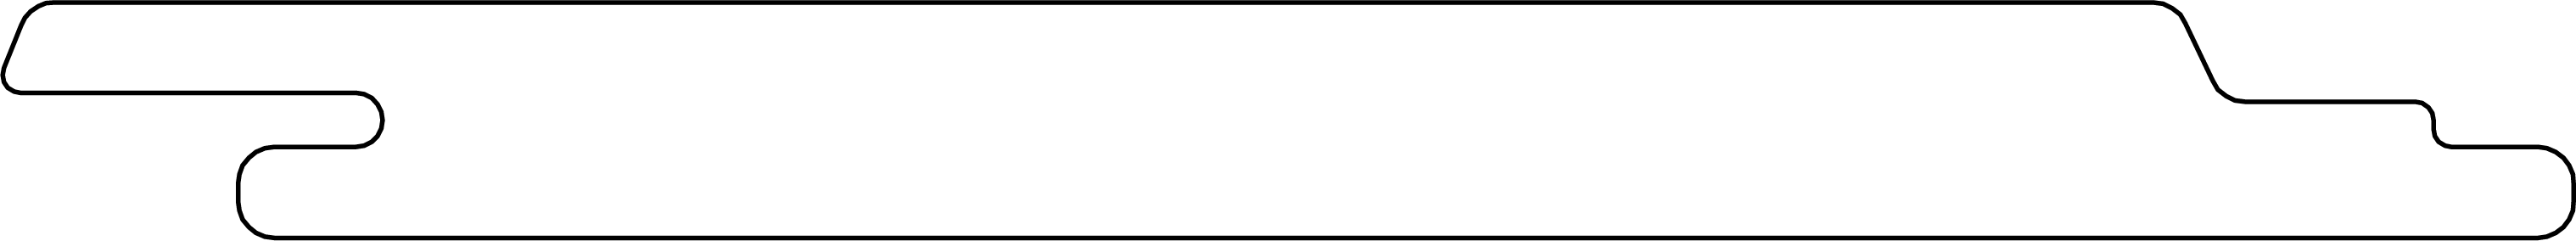 US31 Shadowline Wall Cladding line drawing